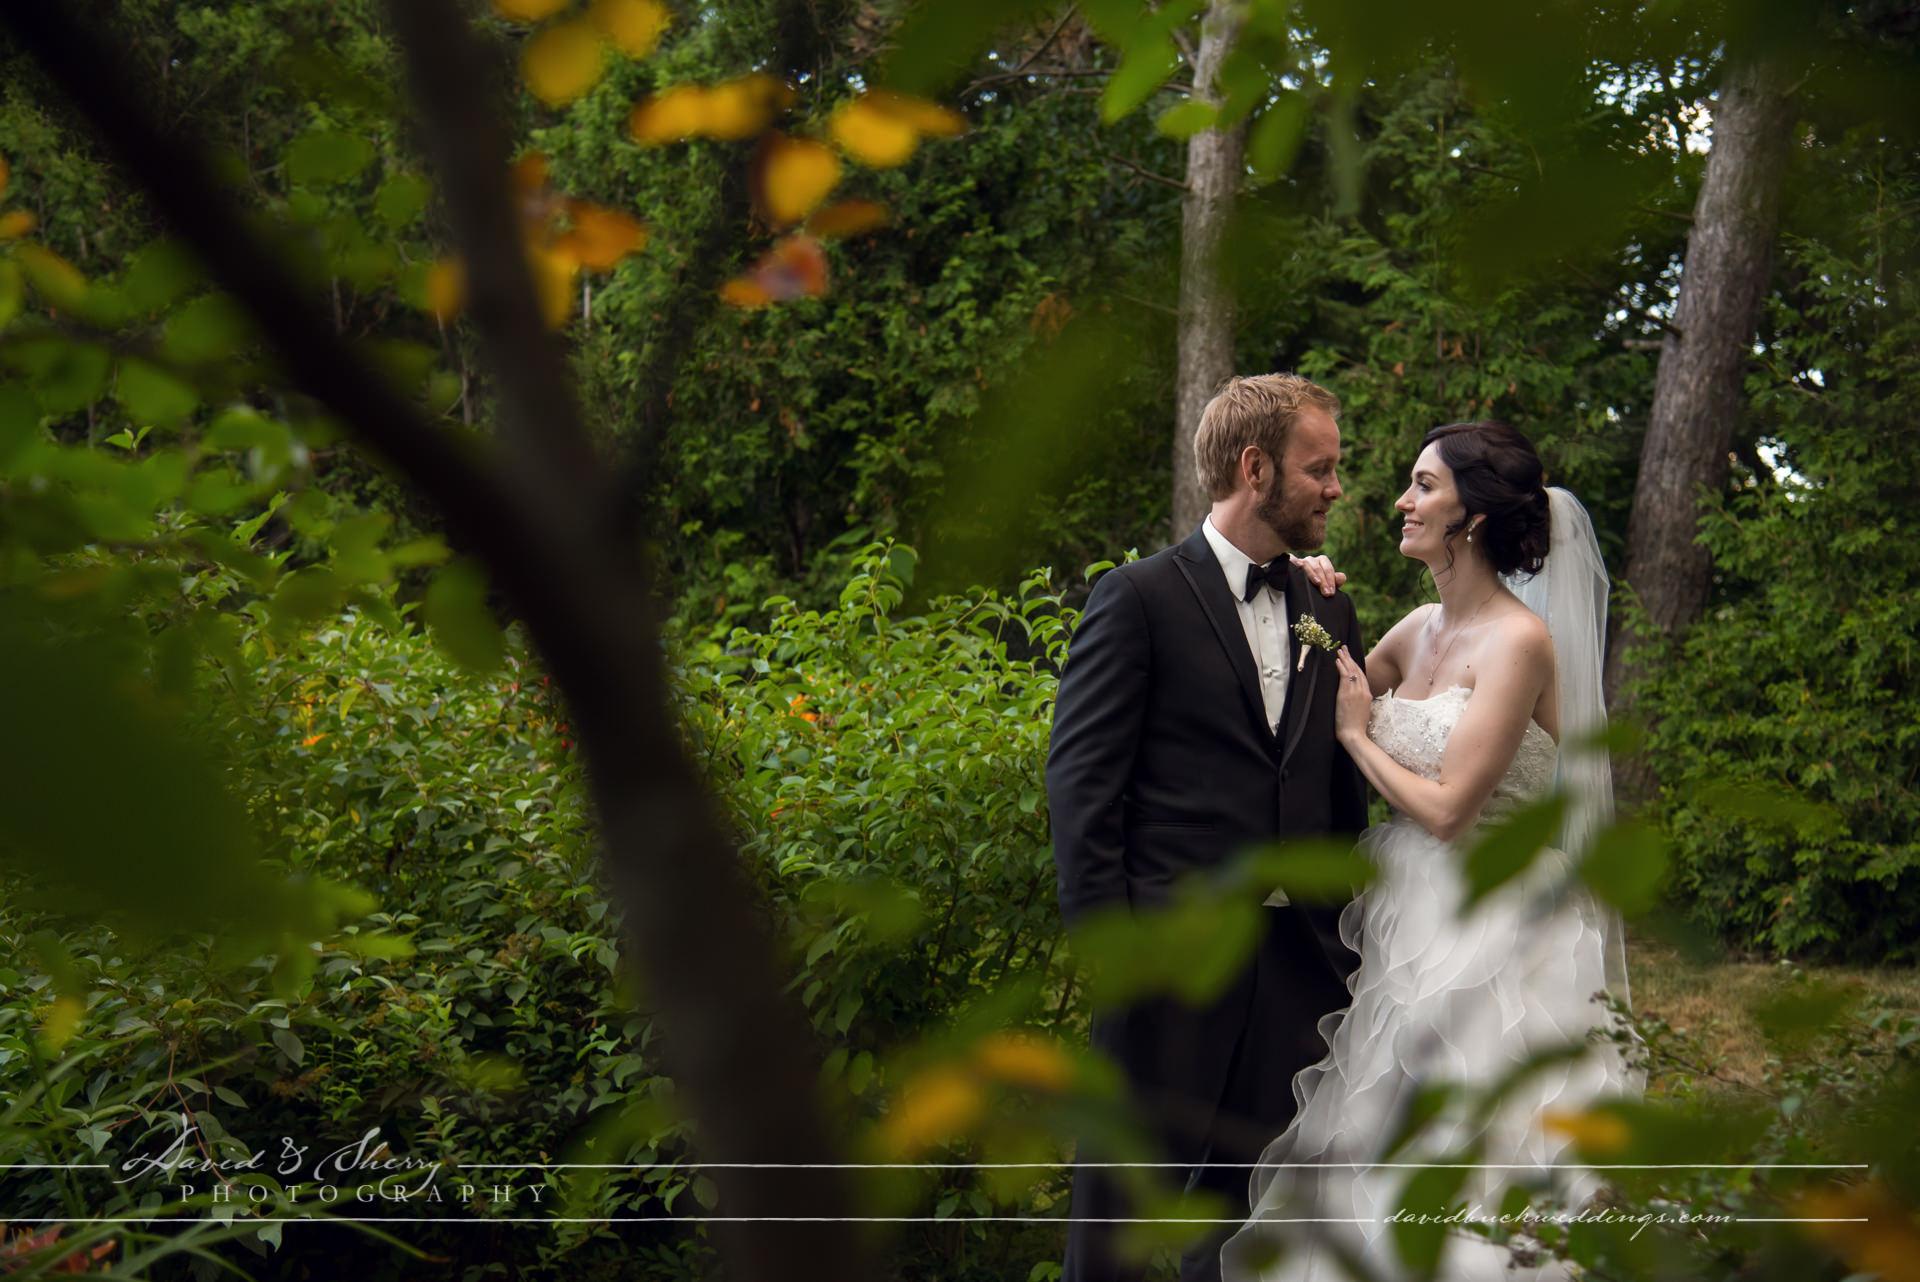 Guelph_Waterloo_Wedding_Photography_56